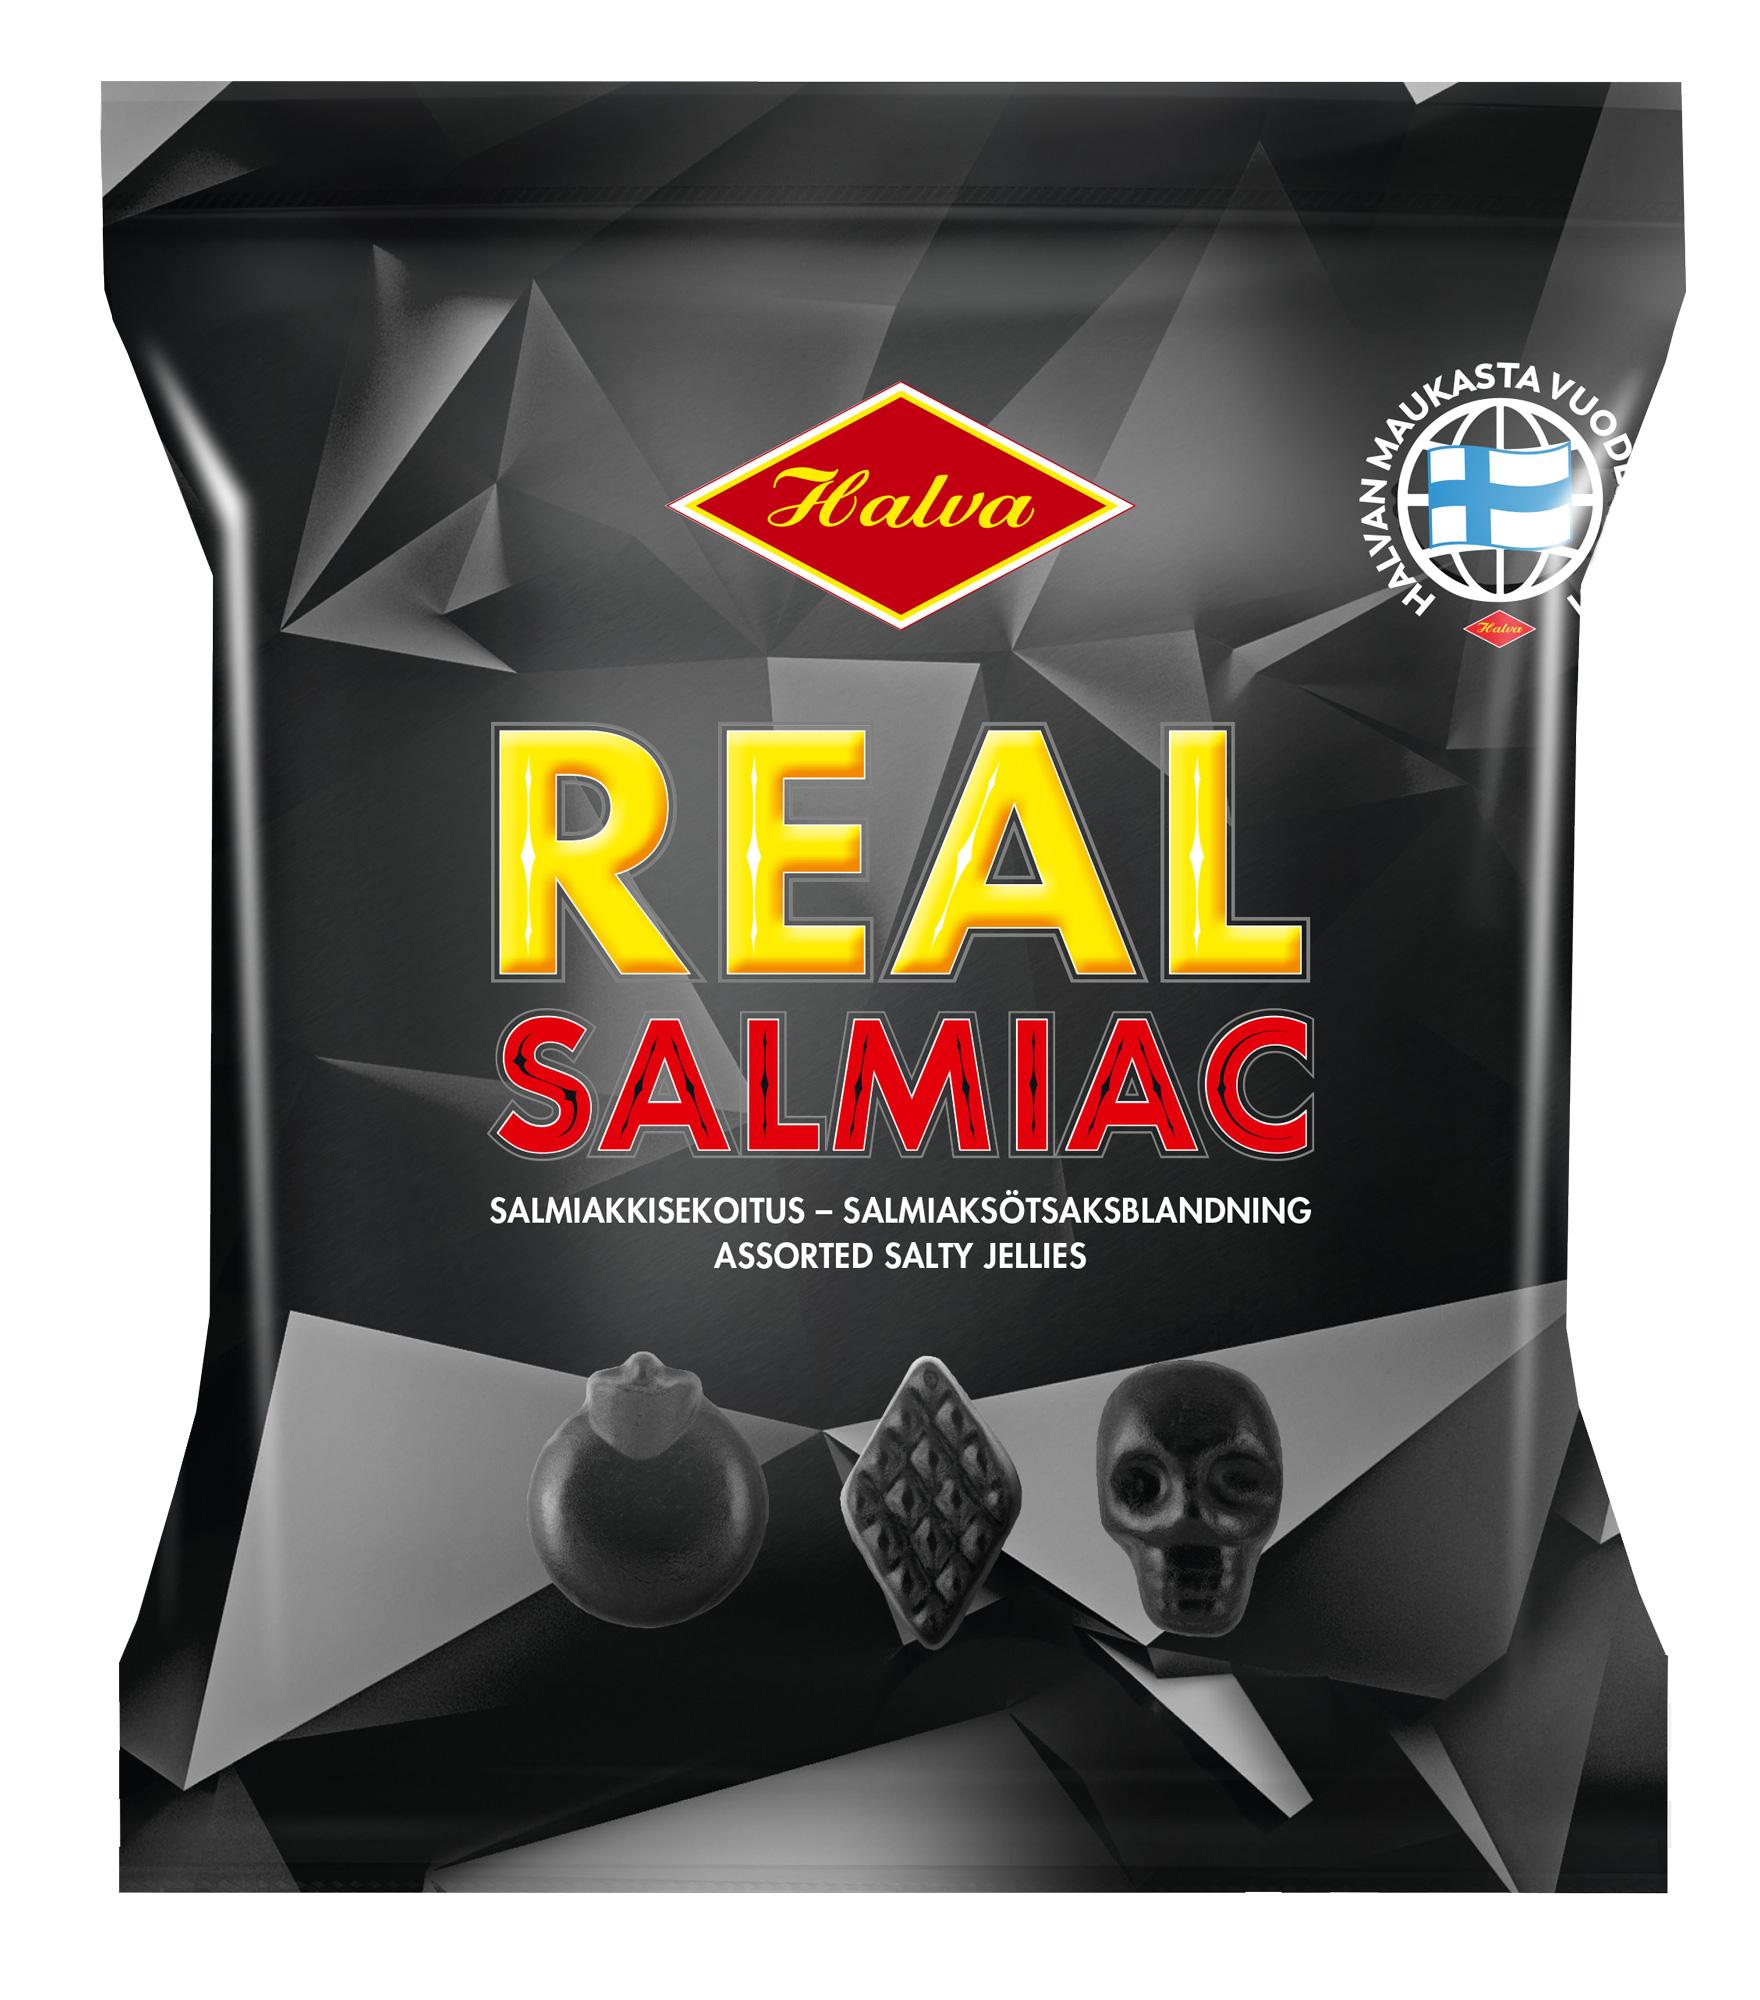 Halva Real Salmiac 120 g